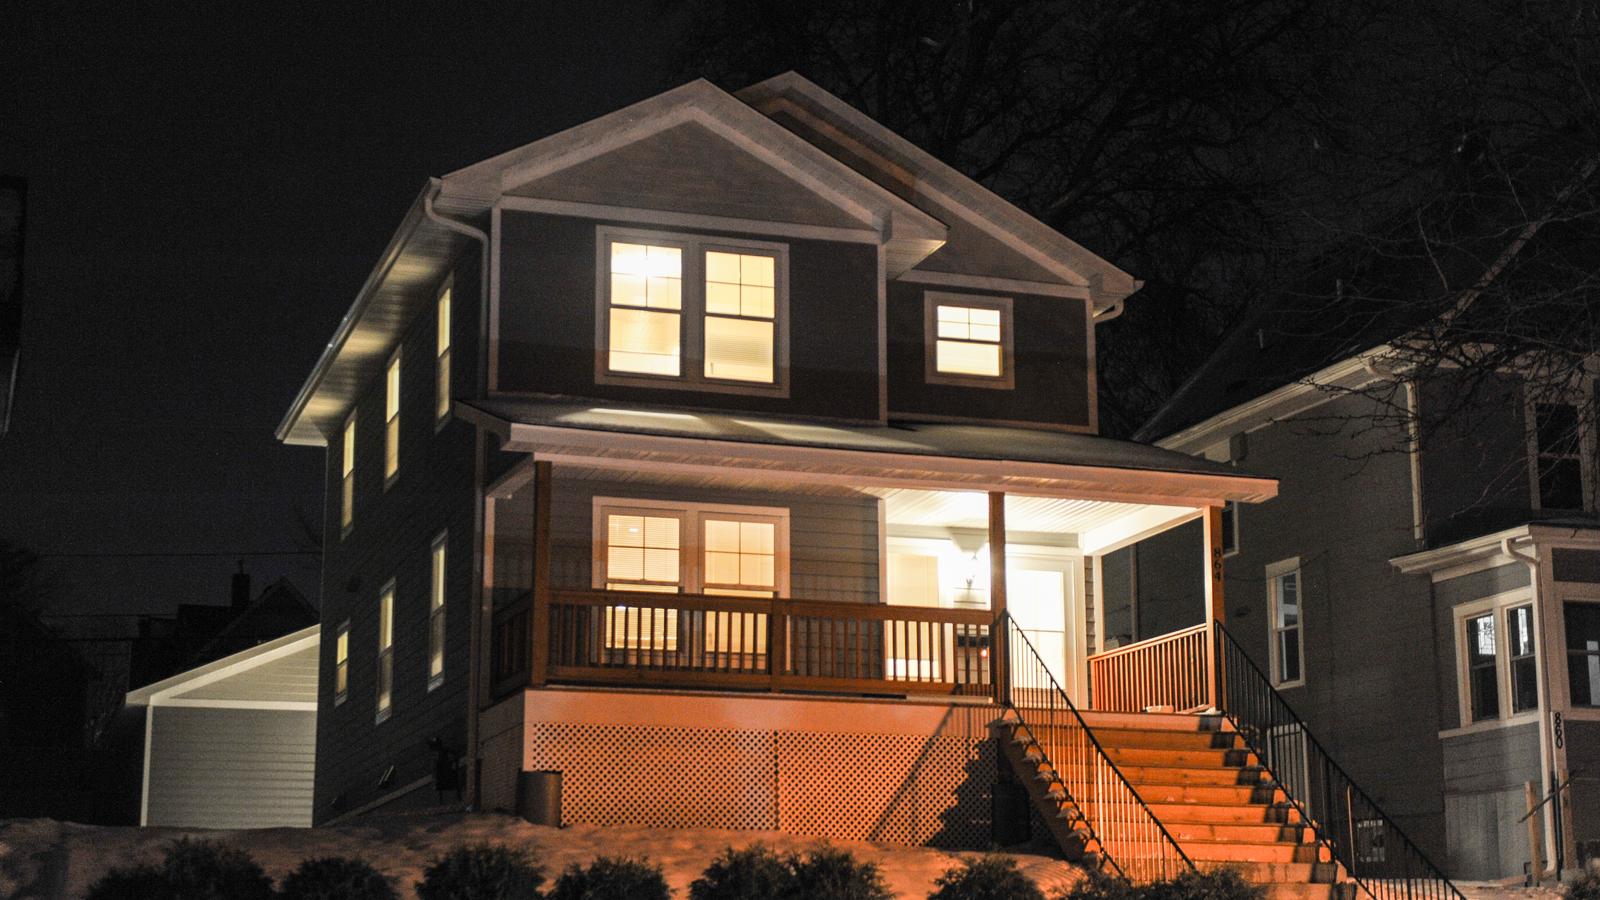 Habitat home at night